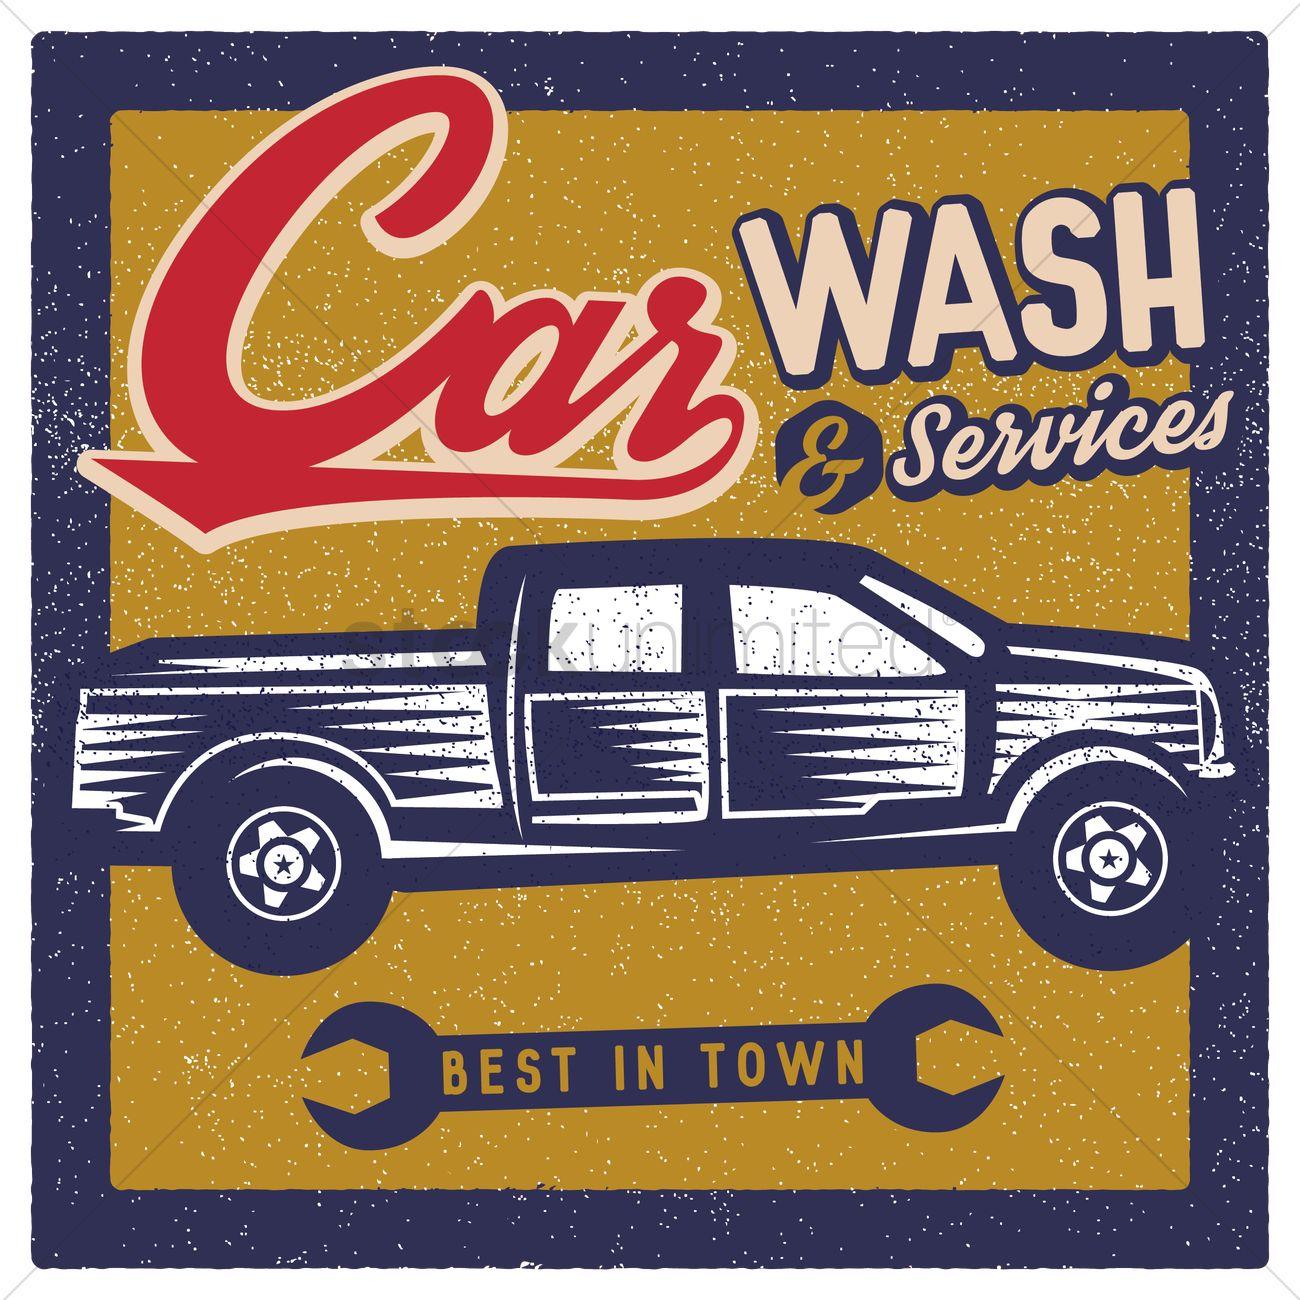 Car wash wallpaper Vector Image   1566342 StockUnlimited 1300x1300